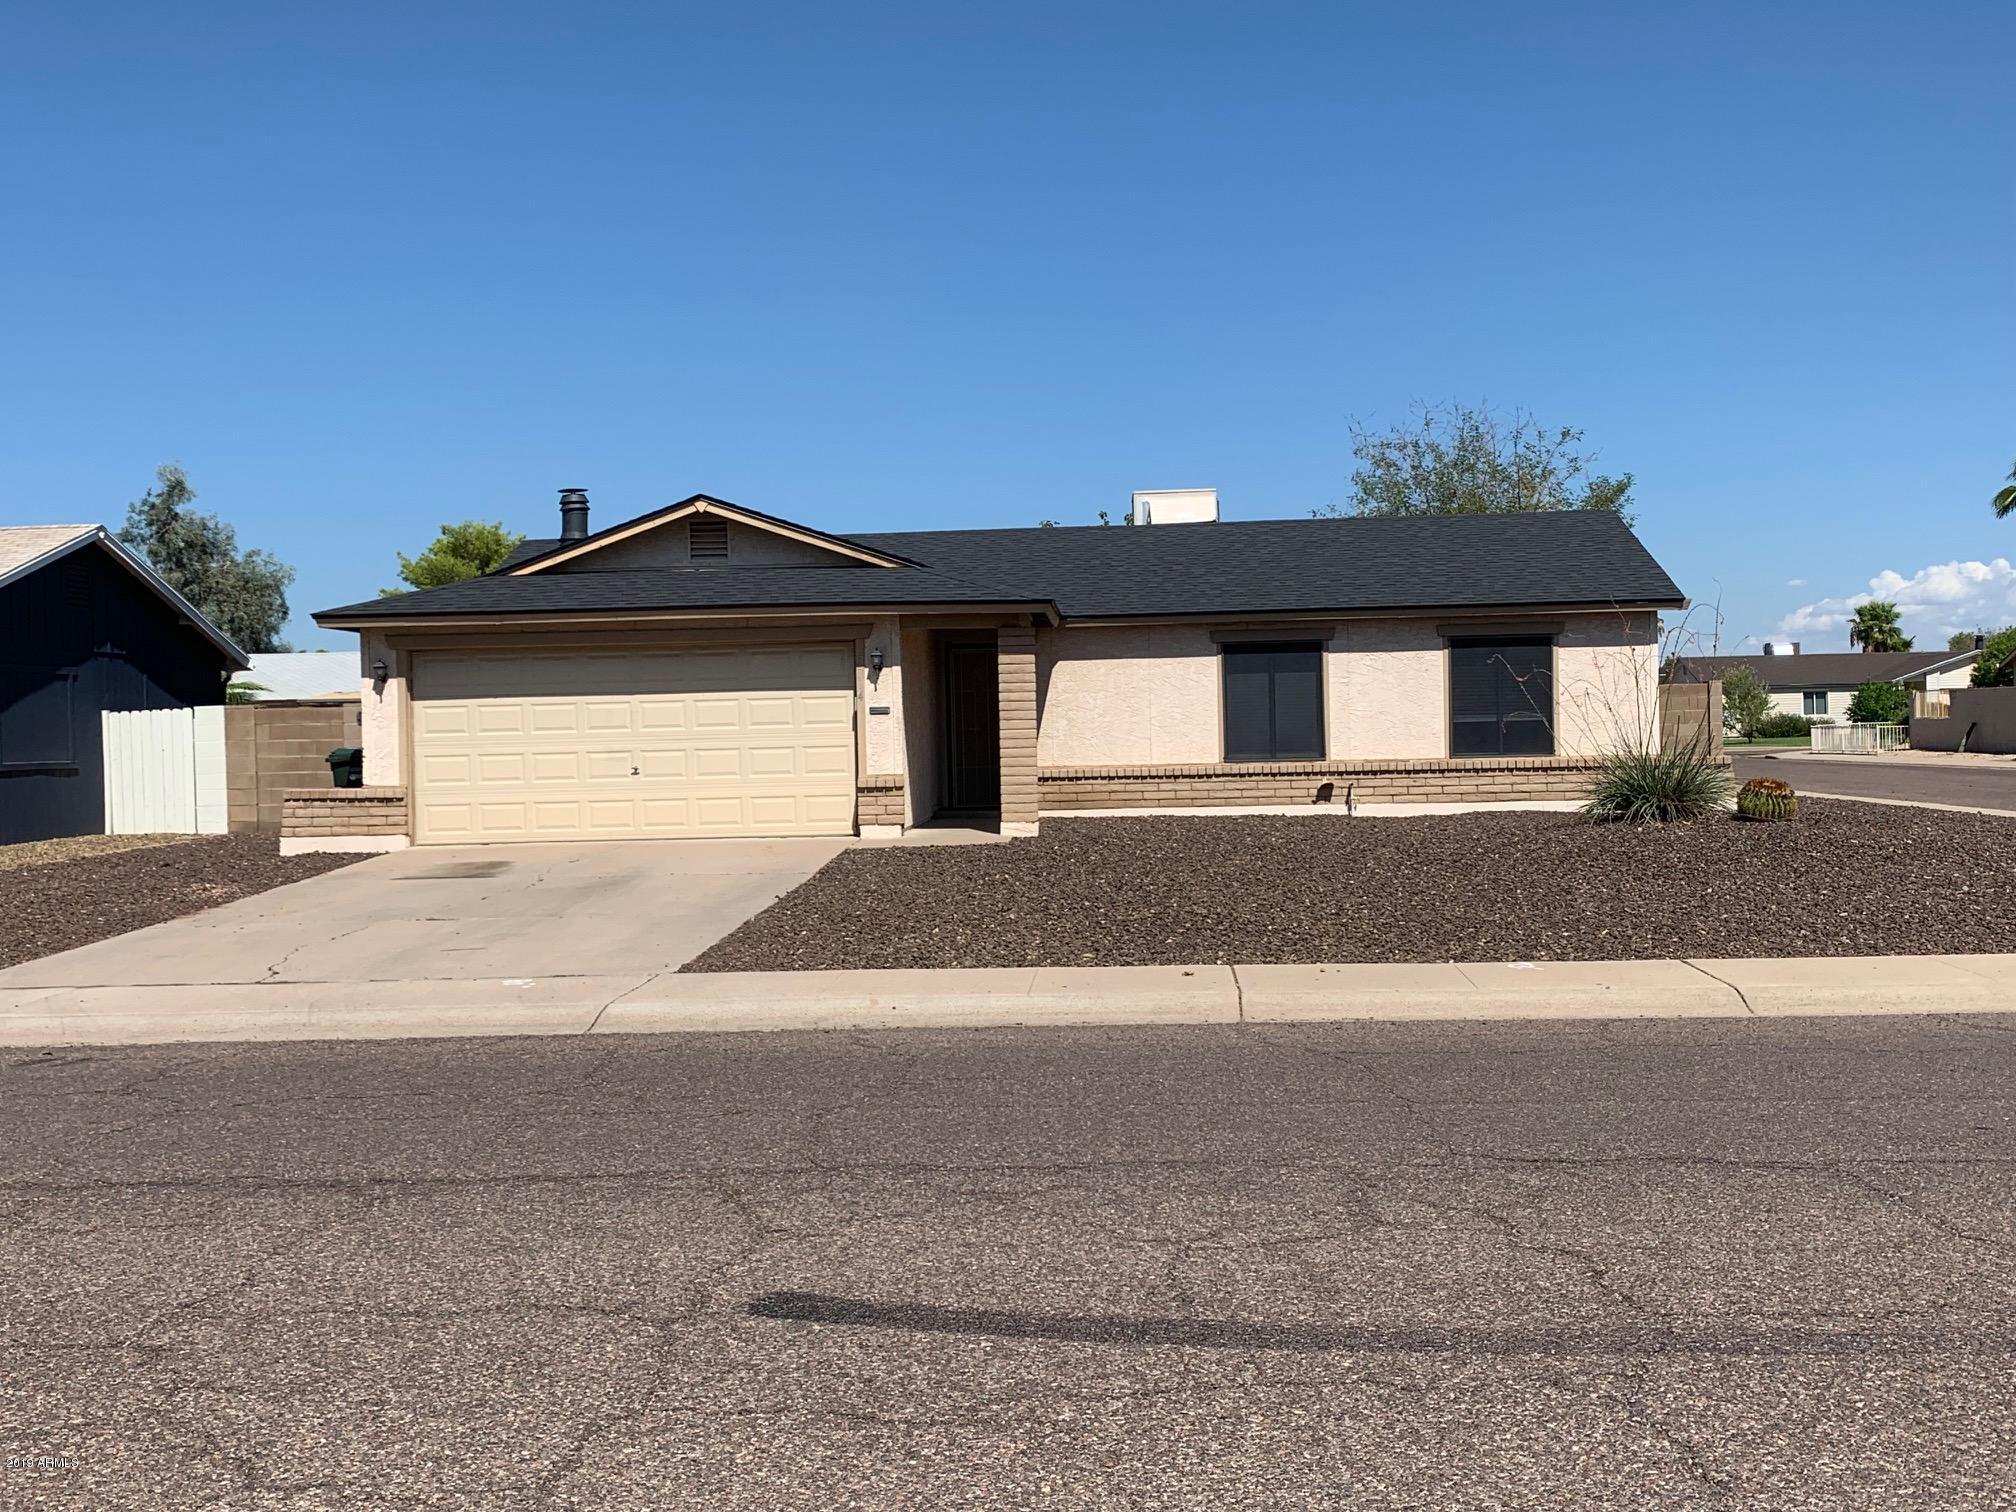 Photo of 3714 E NISBET Road, Phoenix, AZ 85032